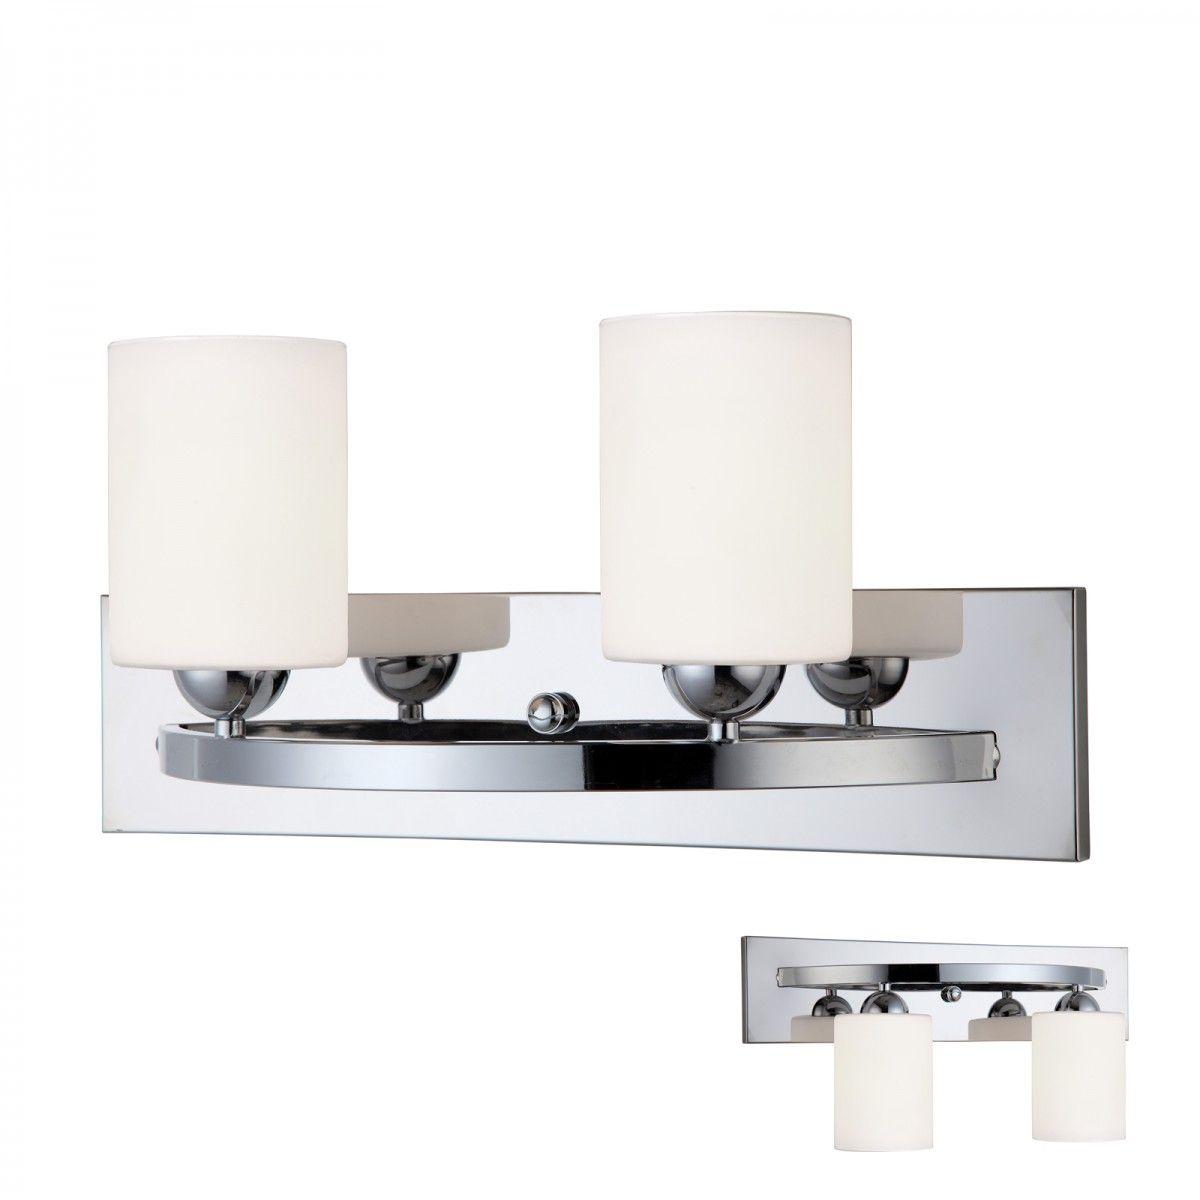 Canarm Ivl370a02ch O Hampton Chrome 2 Globe Vanity Bath Light Bar Interior Lighting Fixture